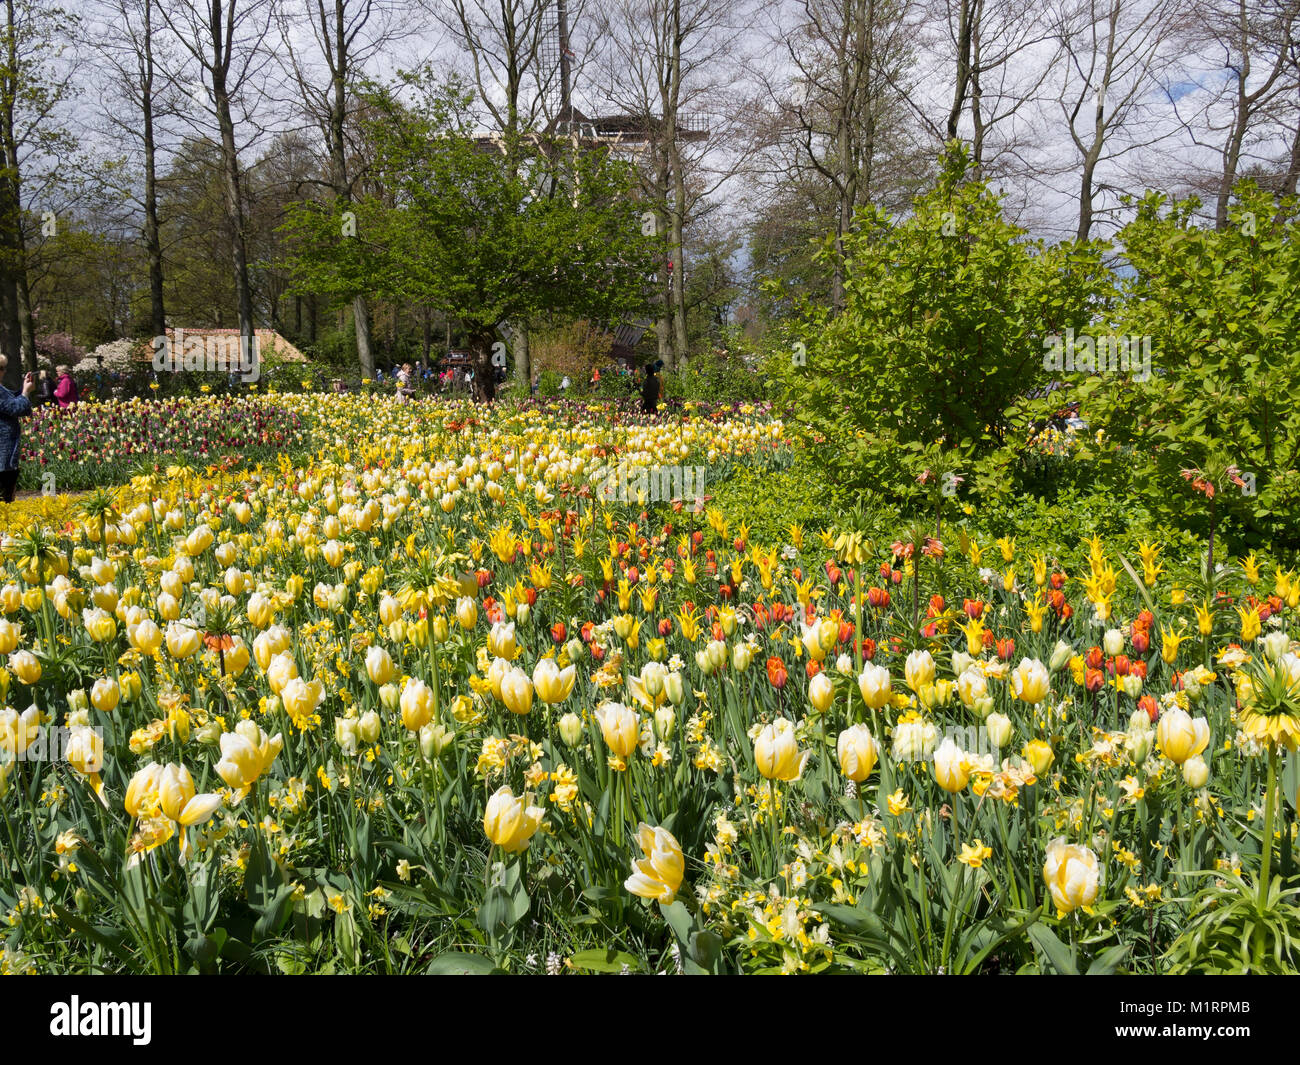 Mass Plantings Of Tulips And Spring Bulbs At Keukenhof Gardens